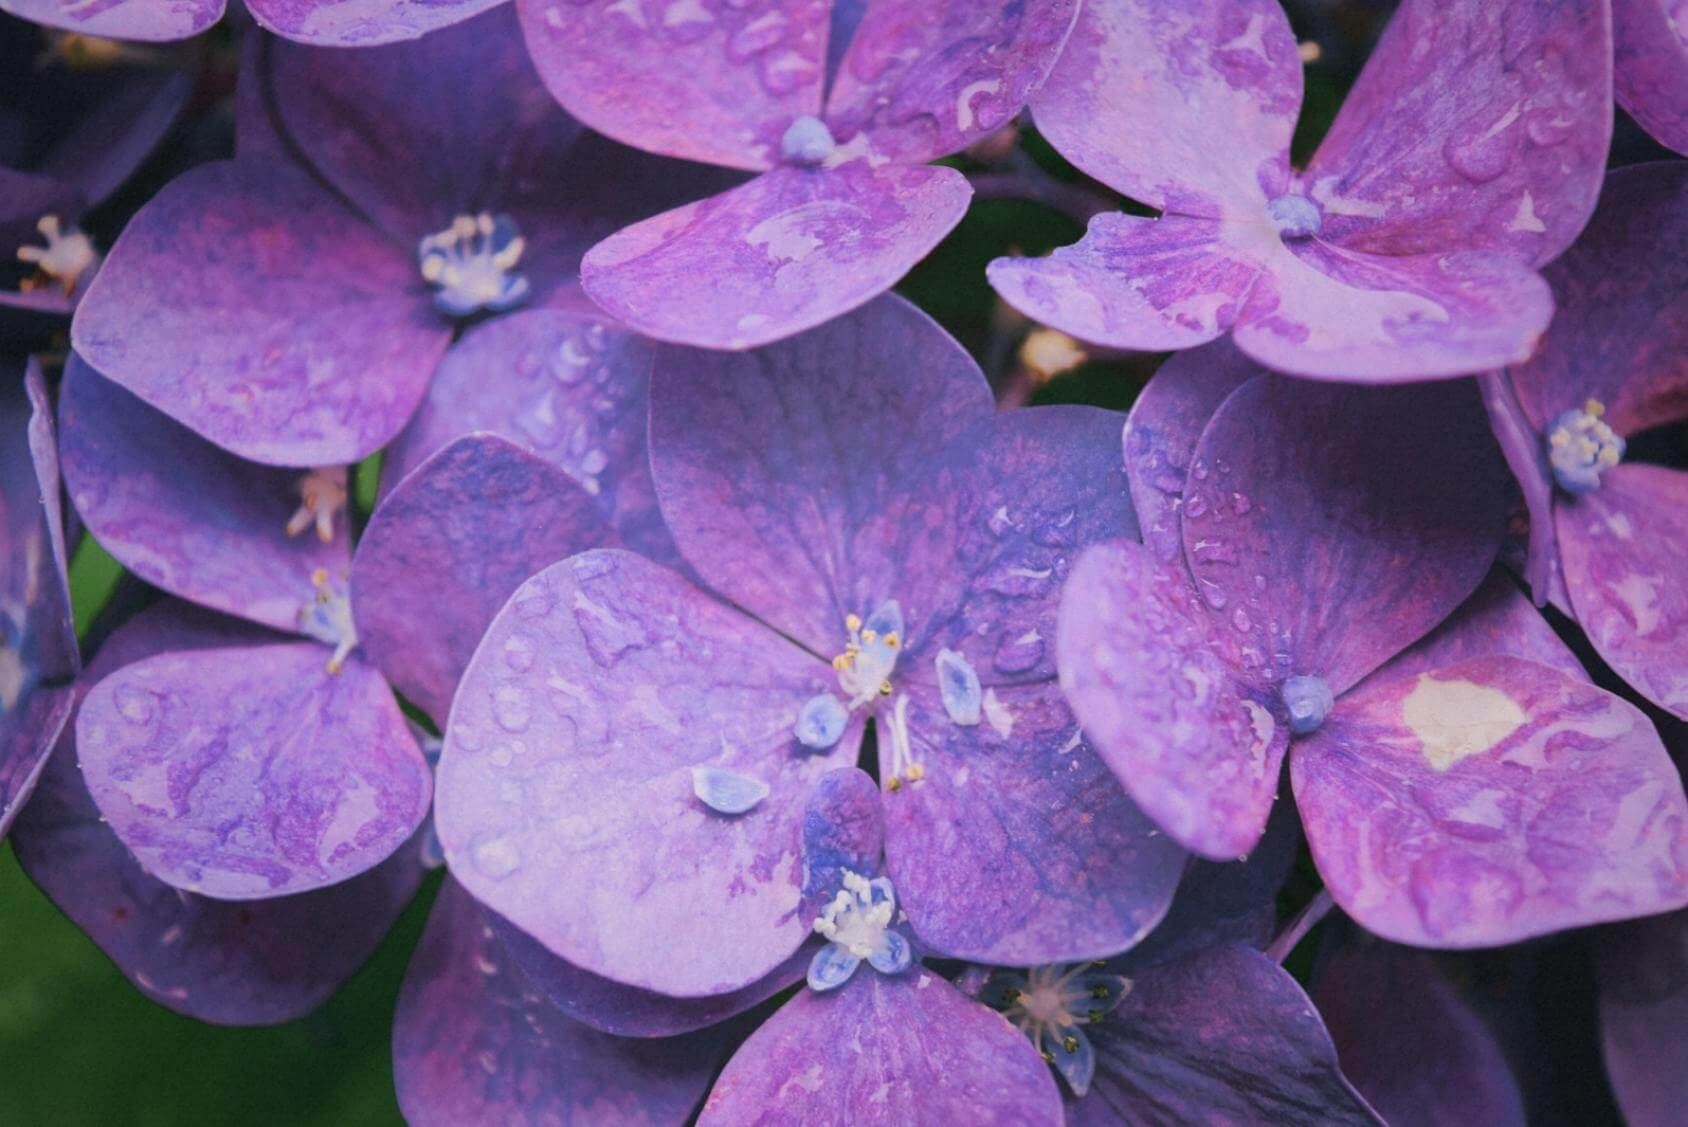 Hydrangeas Flowers - Original image